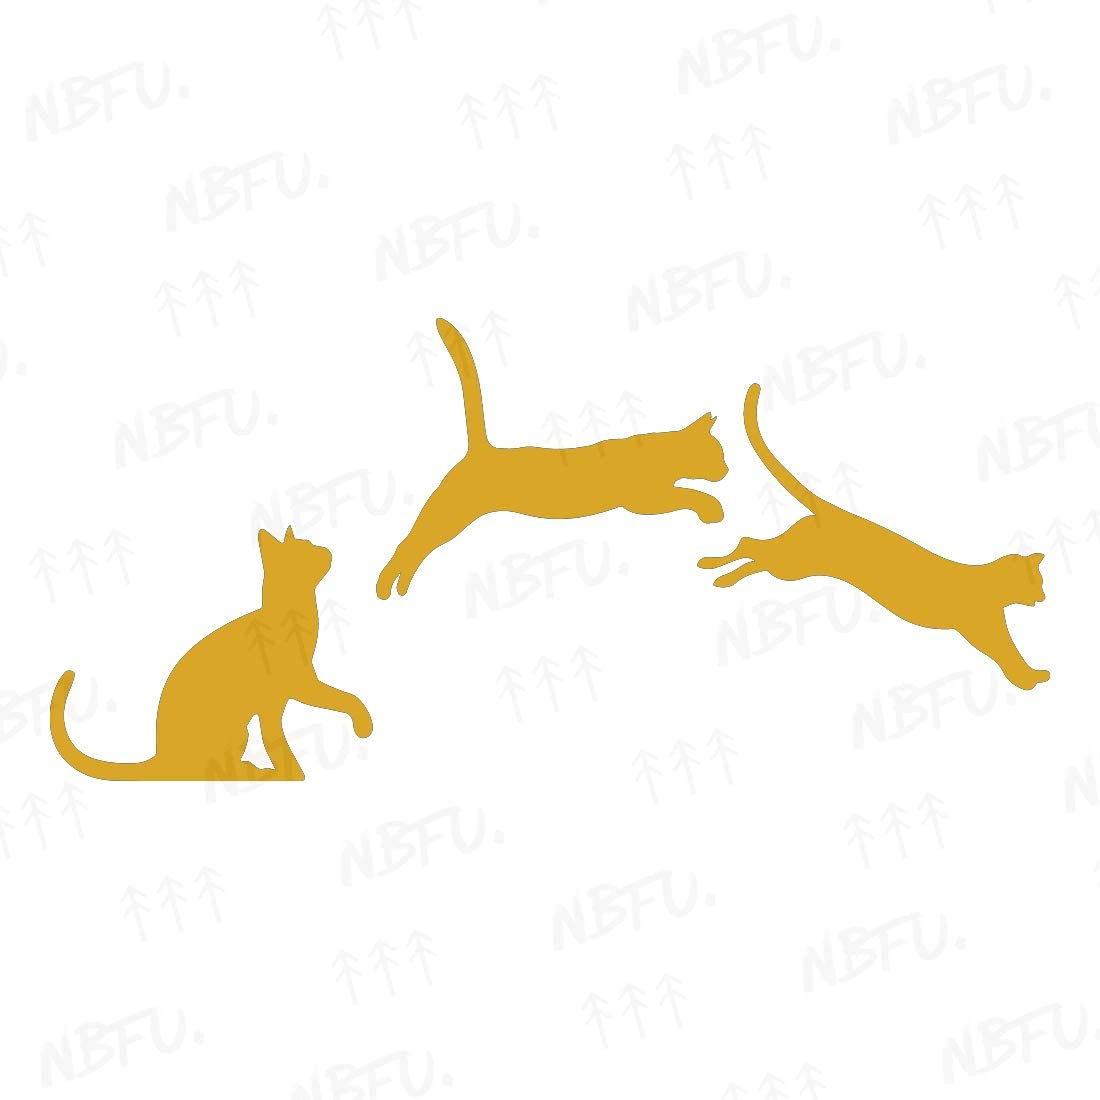 NBFU Decals Jumping Cats Kittens Love (Metallic Gold) (Set of 2) Premium Waterproof Vinyl Decal Stickers for Laptop Phone Accessory Helmet Car Window Bumper Mug Tuber Cup Door Wall Decoration